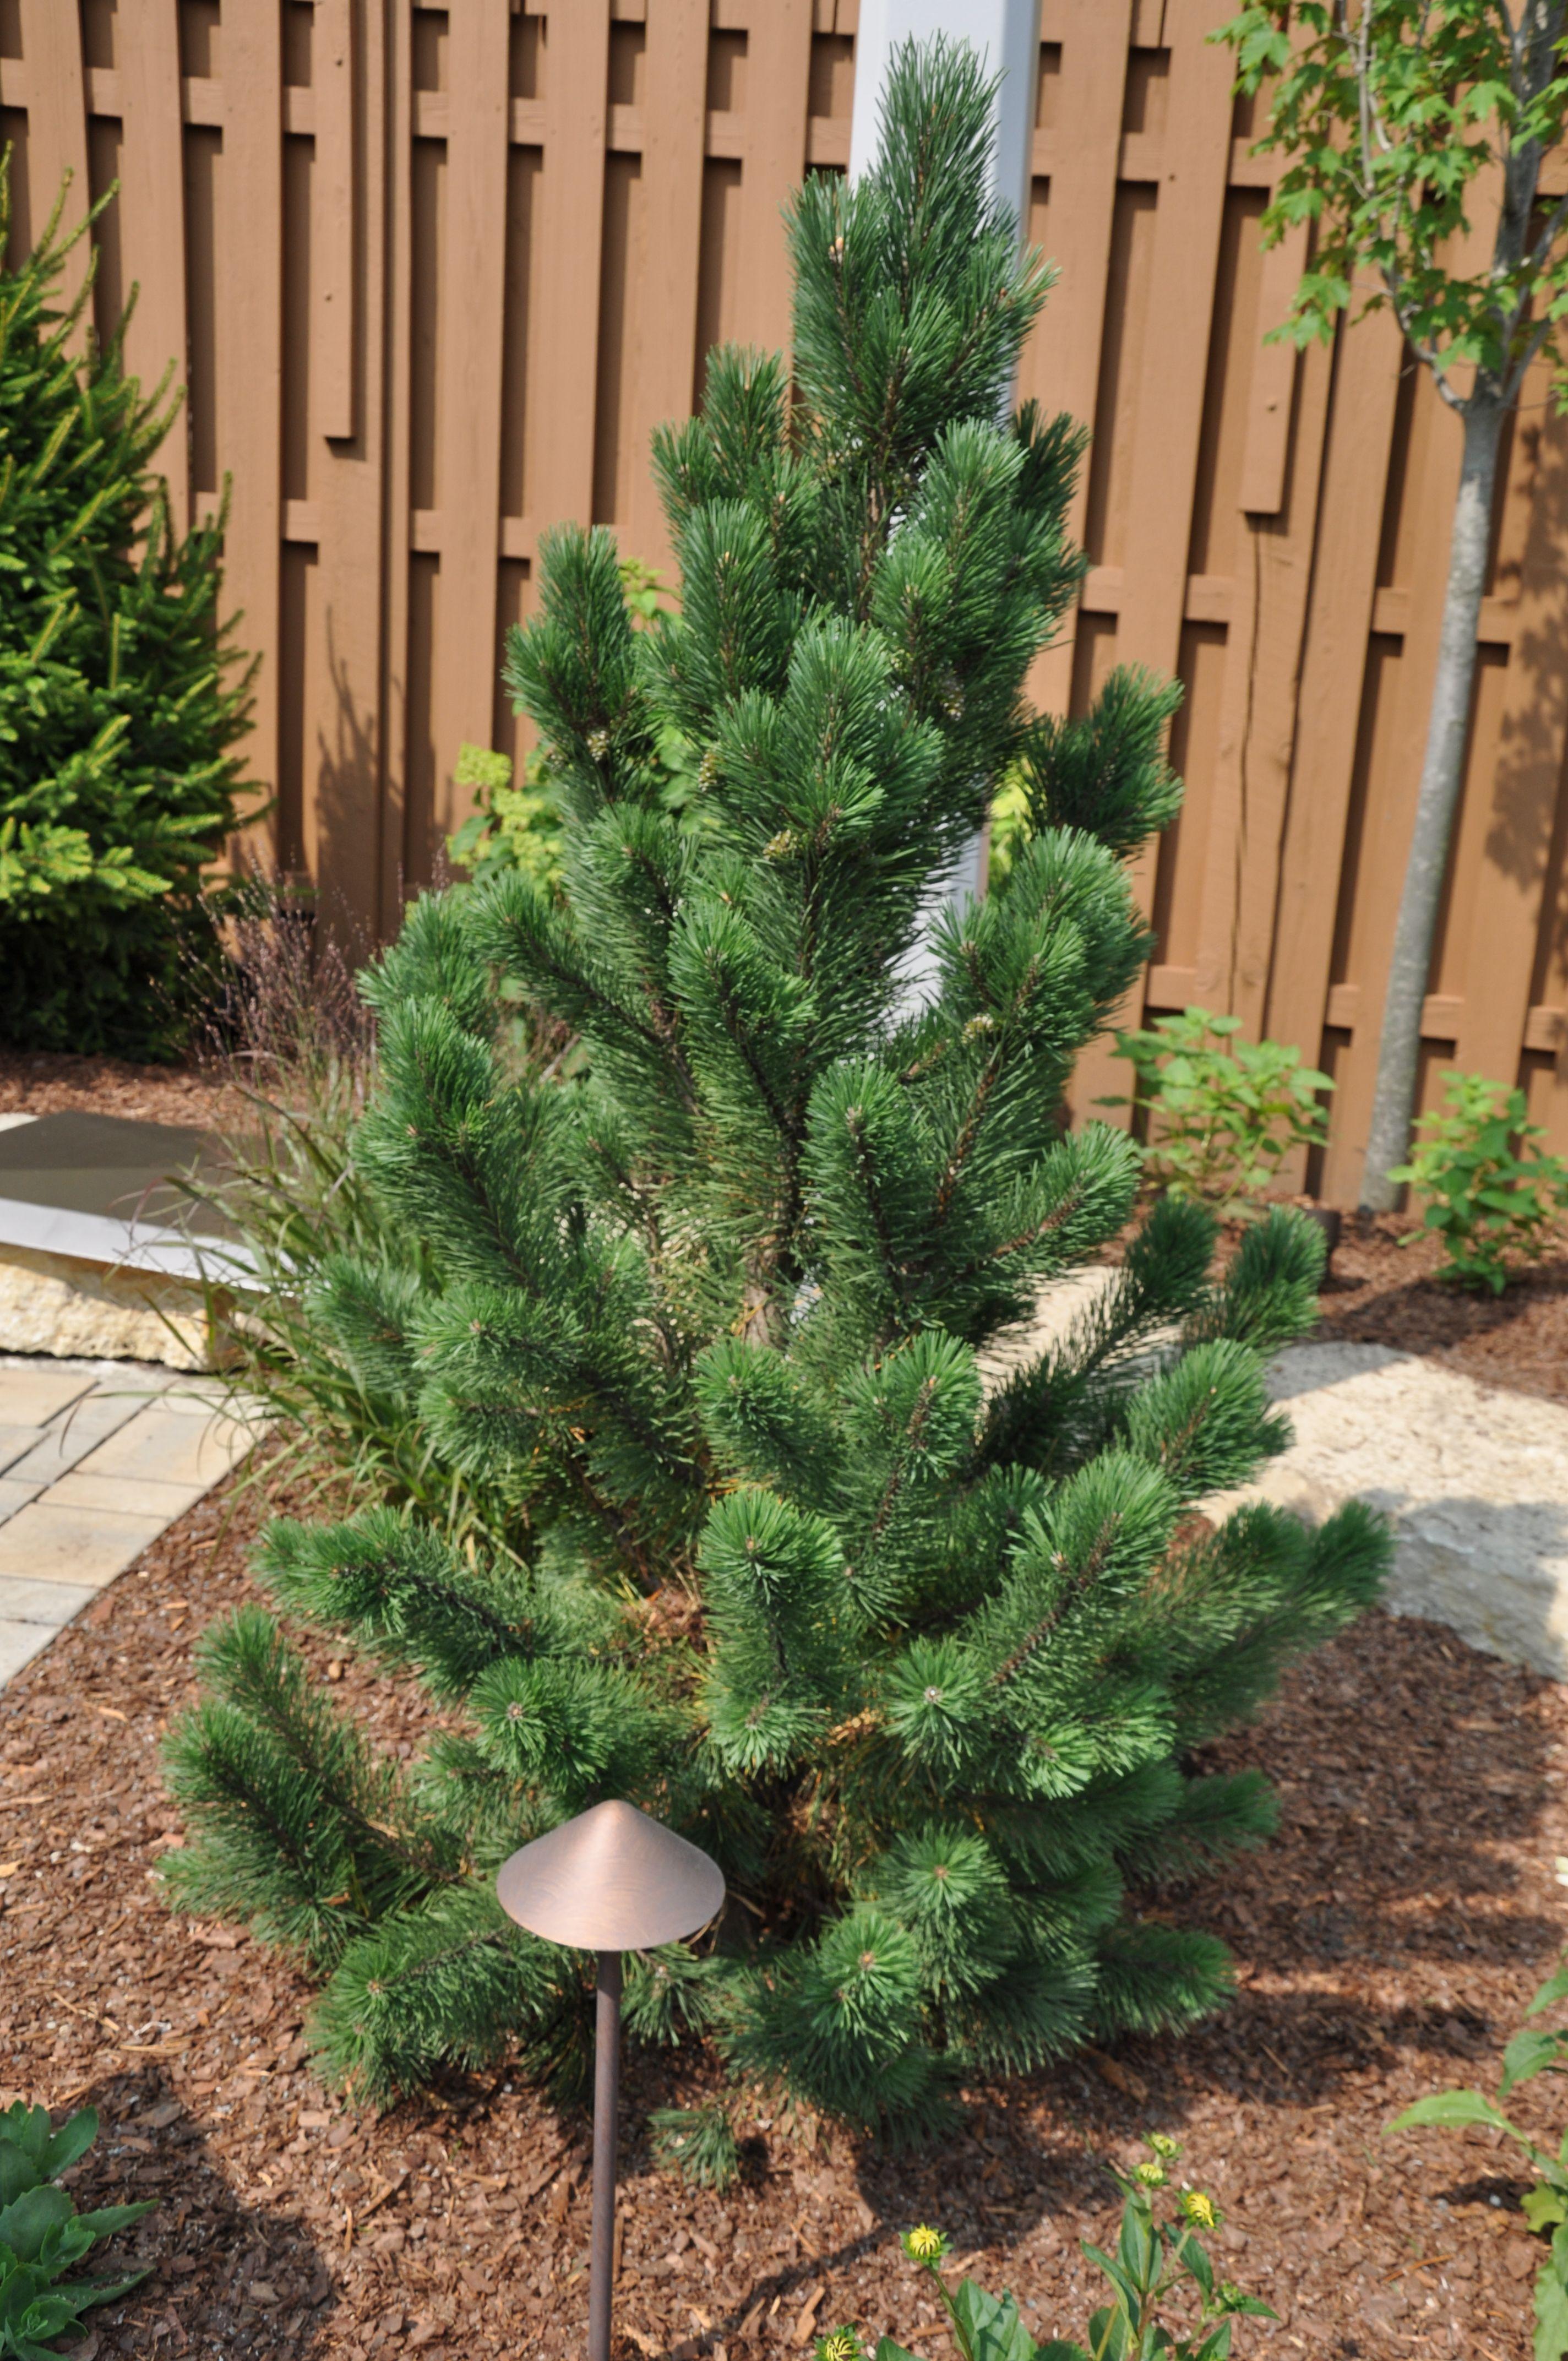 tannenbaum mugo pine Google Search Plants, Mugo pine